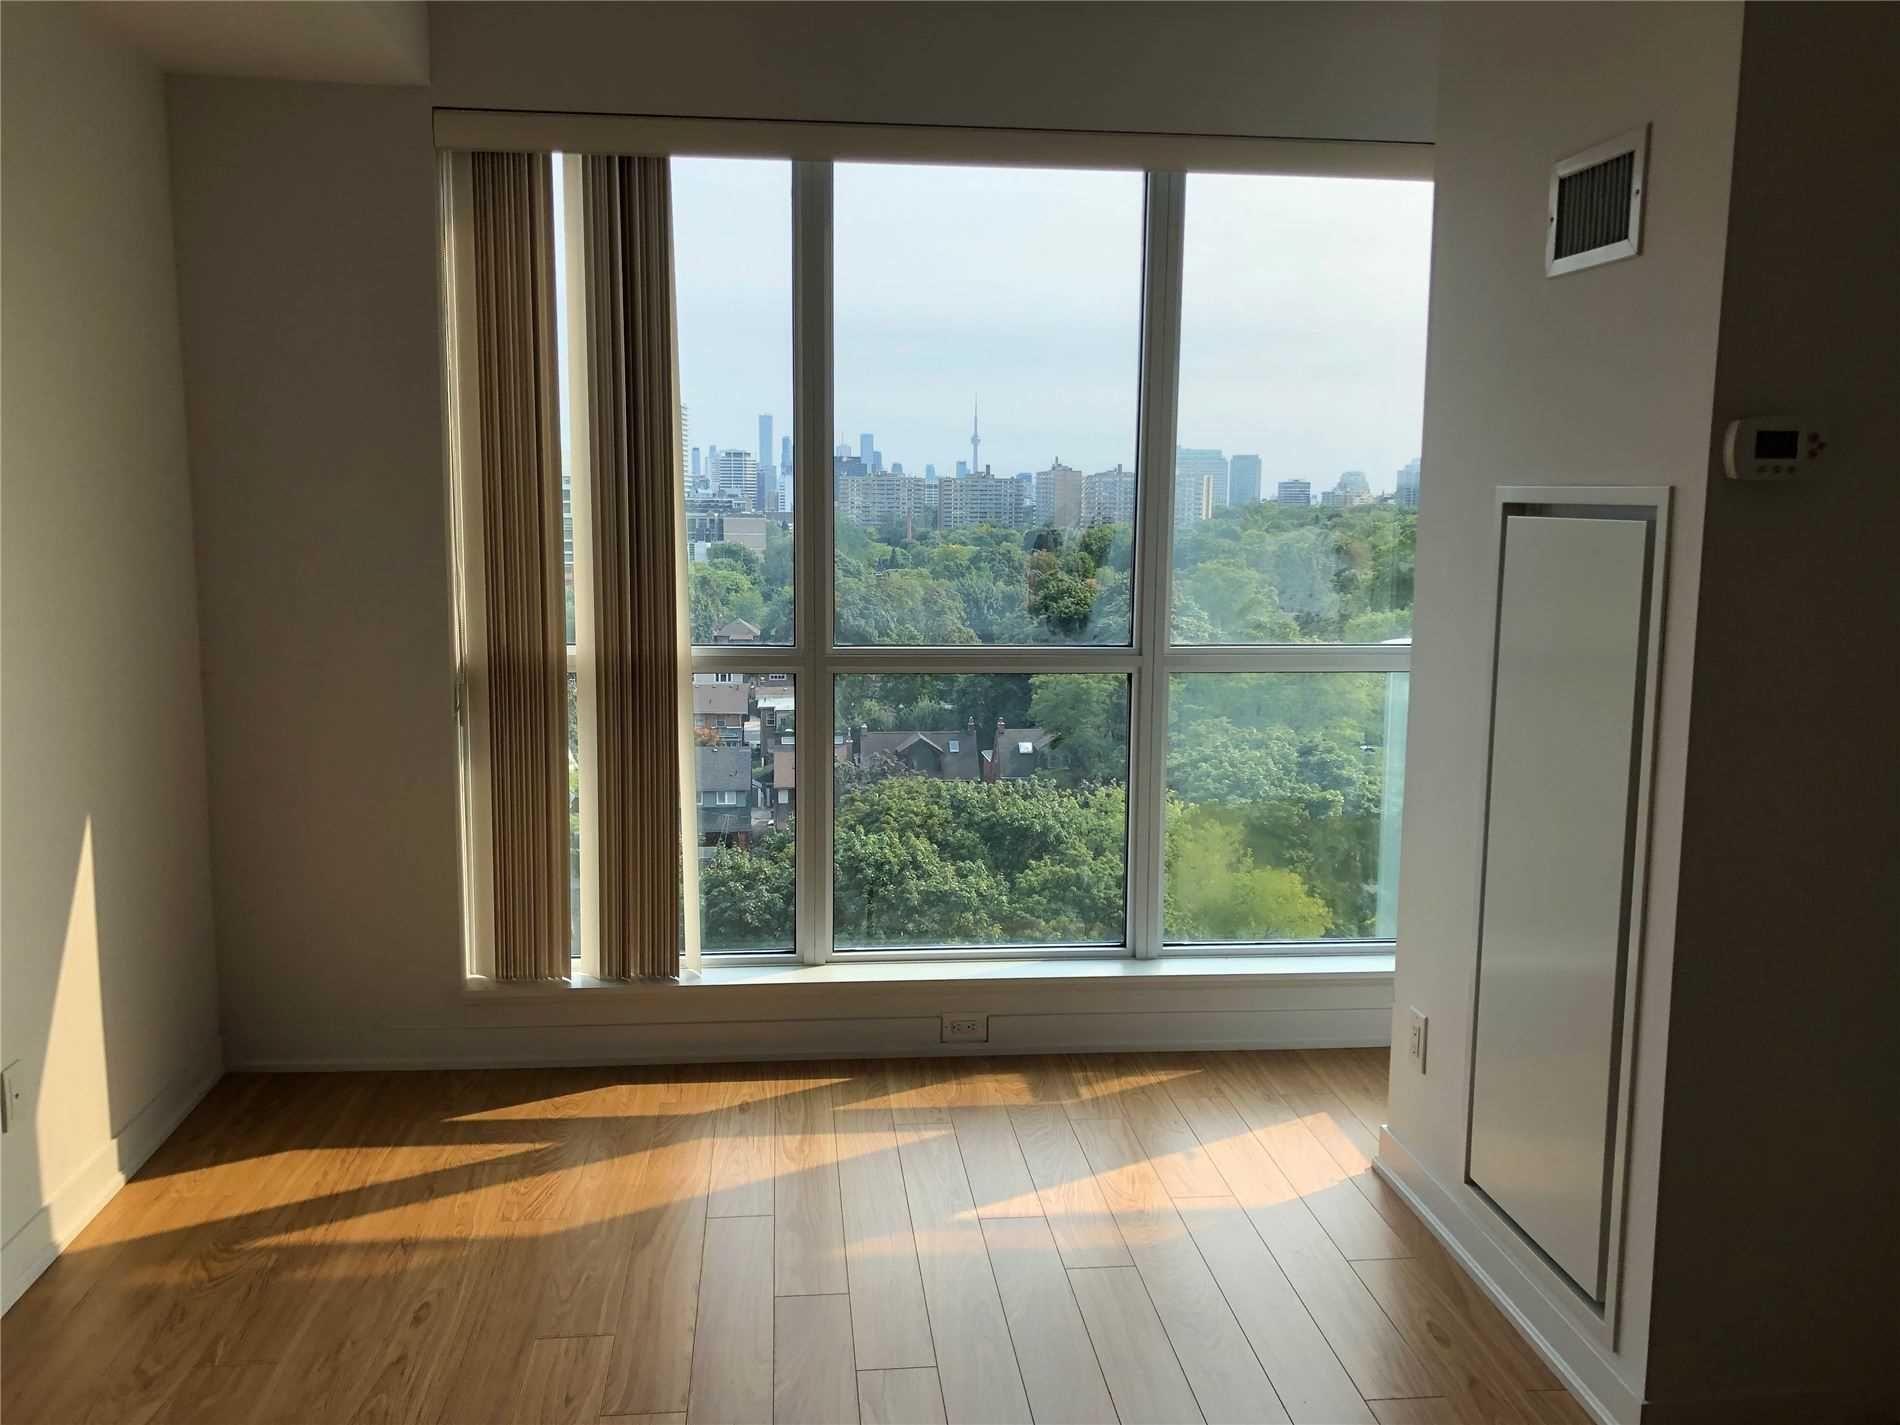 Photo 7: Photos: 1103 60 Berwick Avenue in Toronto: Yonge-Eglinton Condo for lease (Toronto C03)  : MLS®# C4822743